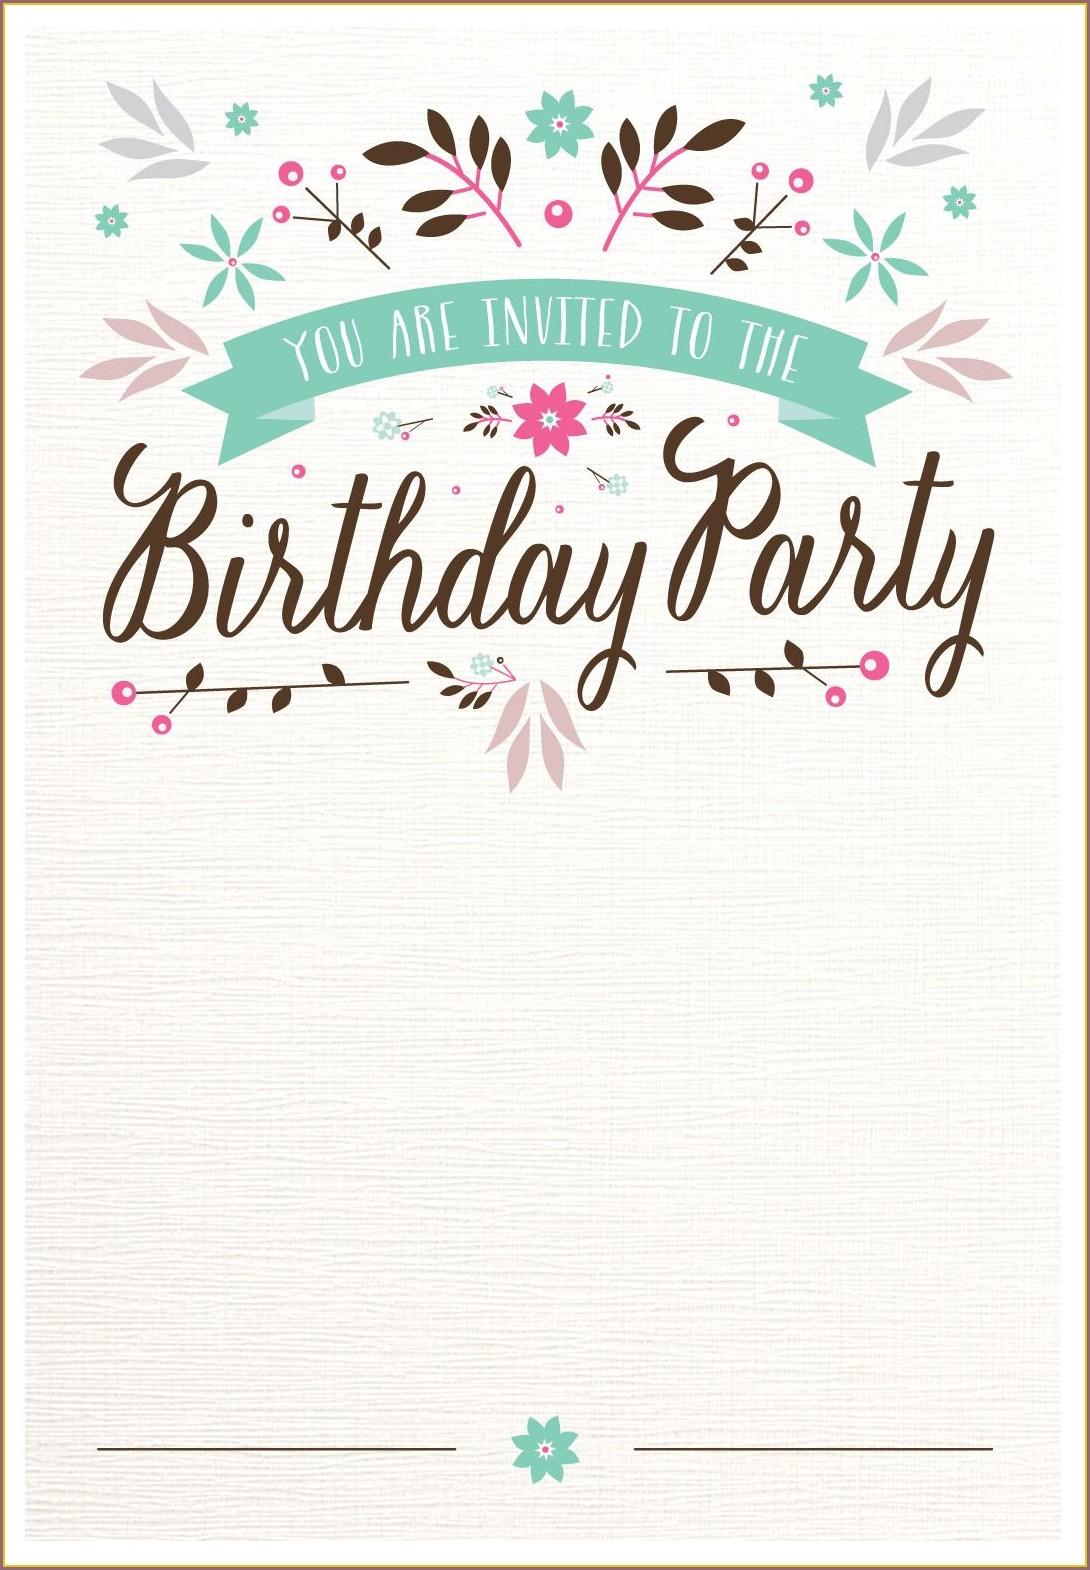 Printable Birthday Invitation Cards With Photos